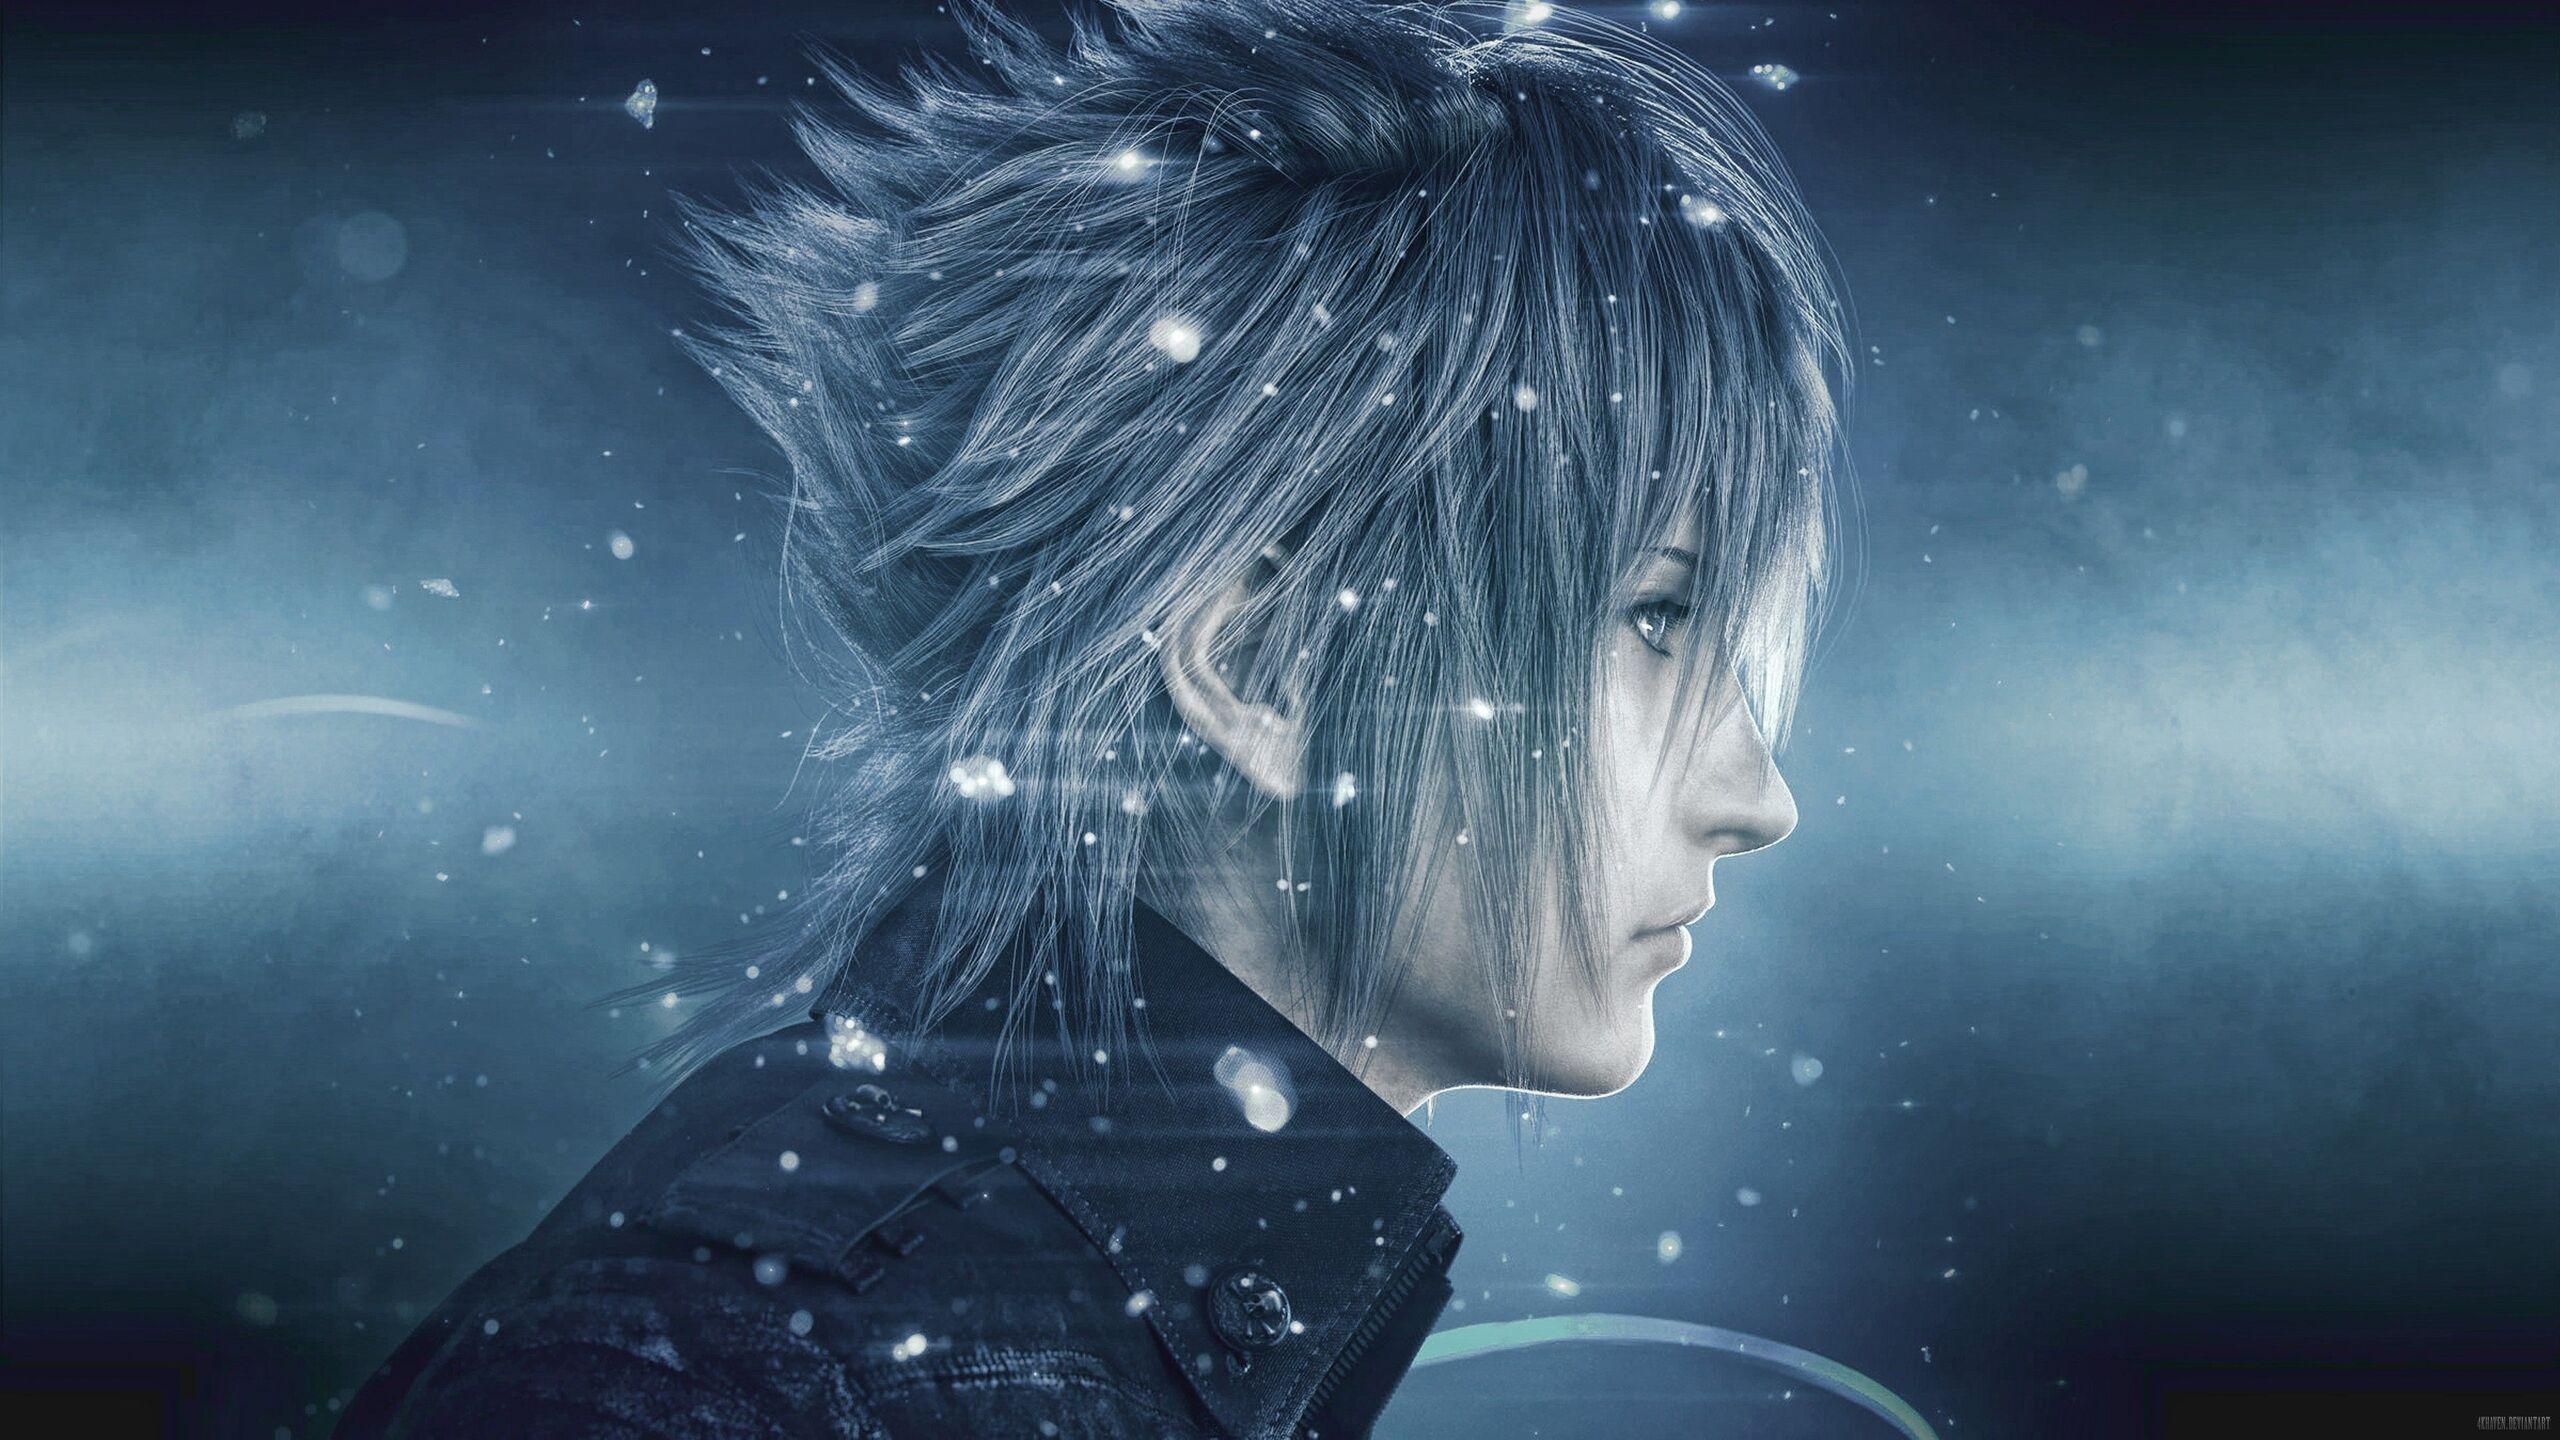 2560x1440 Final Fantasy XV Noctis 1440P Resolution HD 4k ...